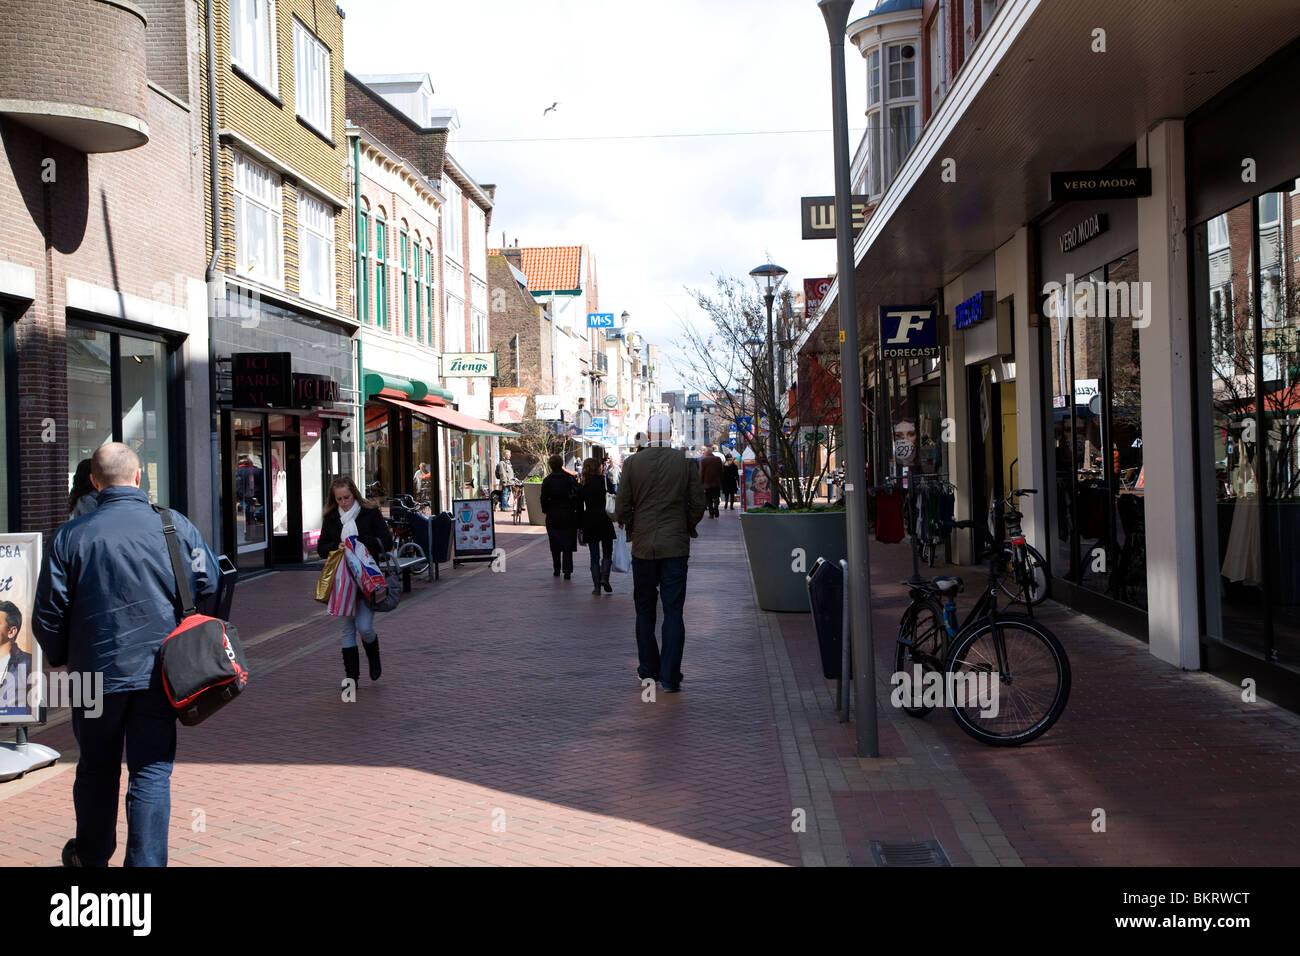 Verkehrsberuhigten Einkaufsstraße, Den Helder, Niederlande Stockbild